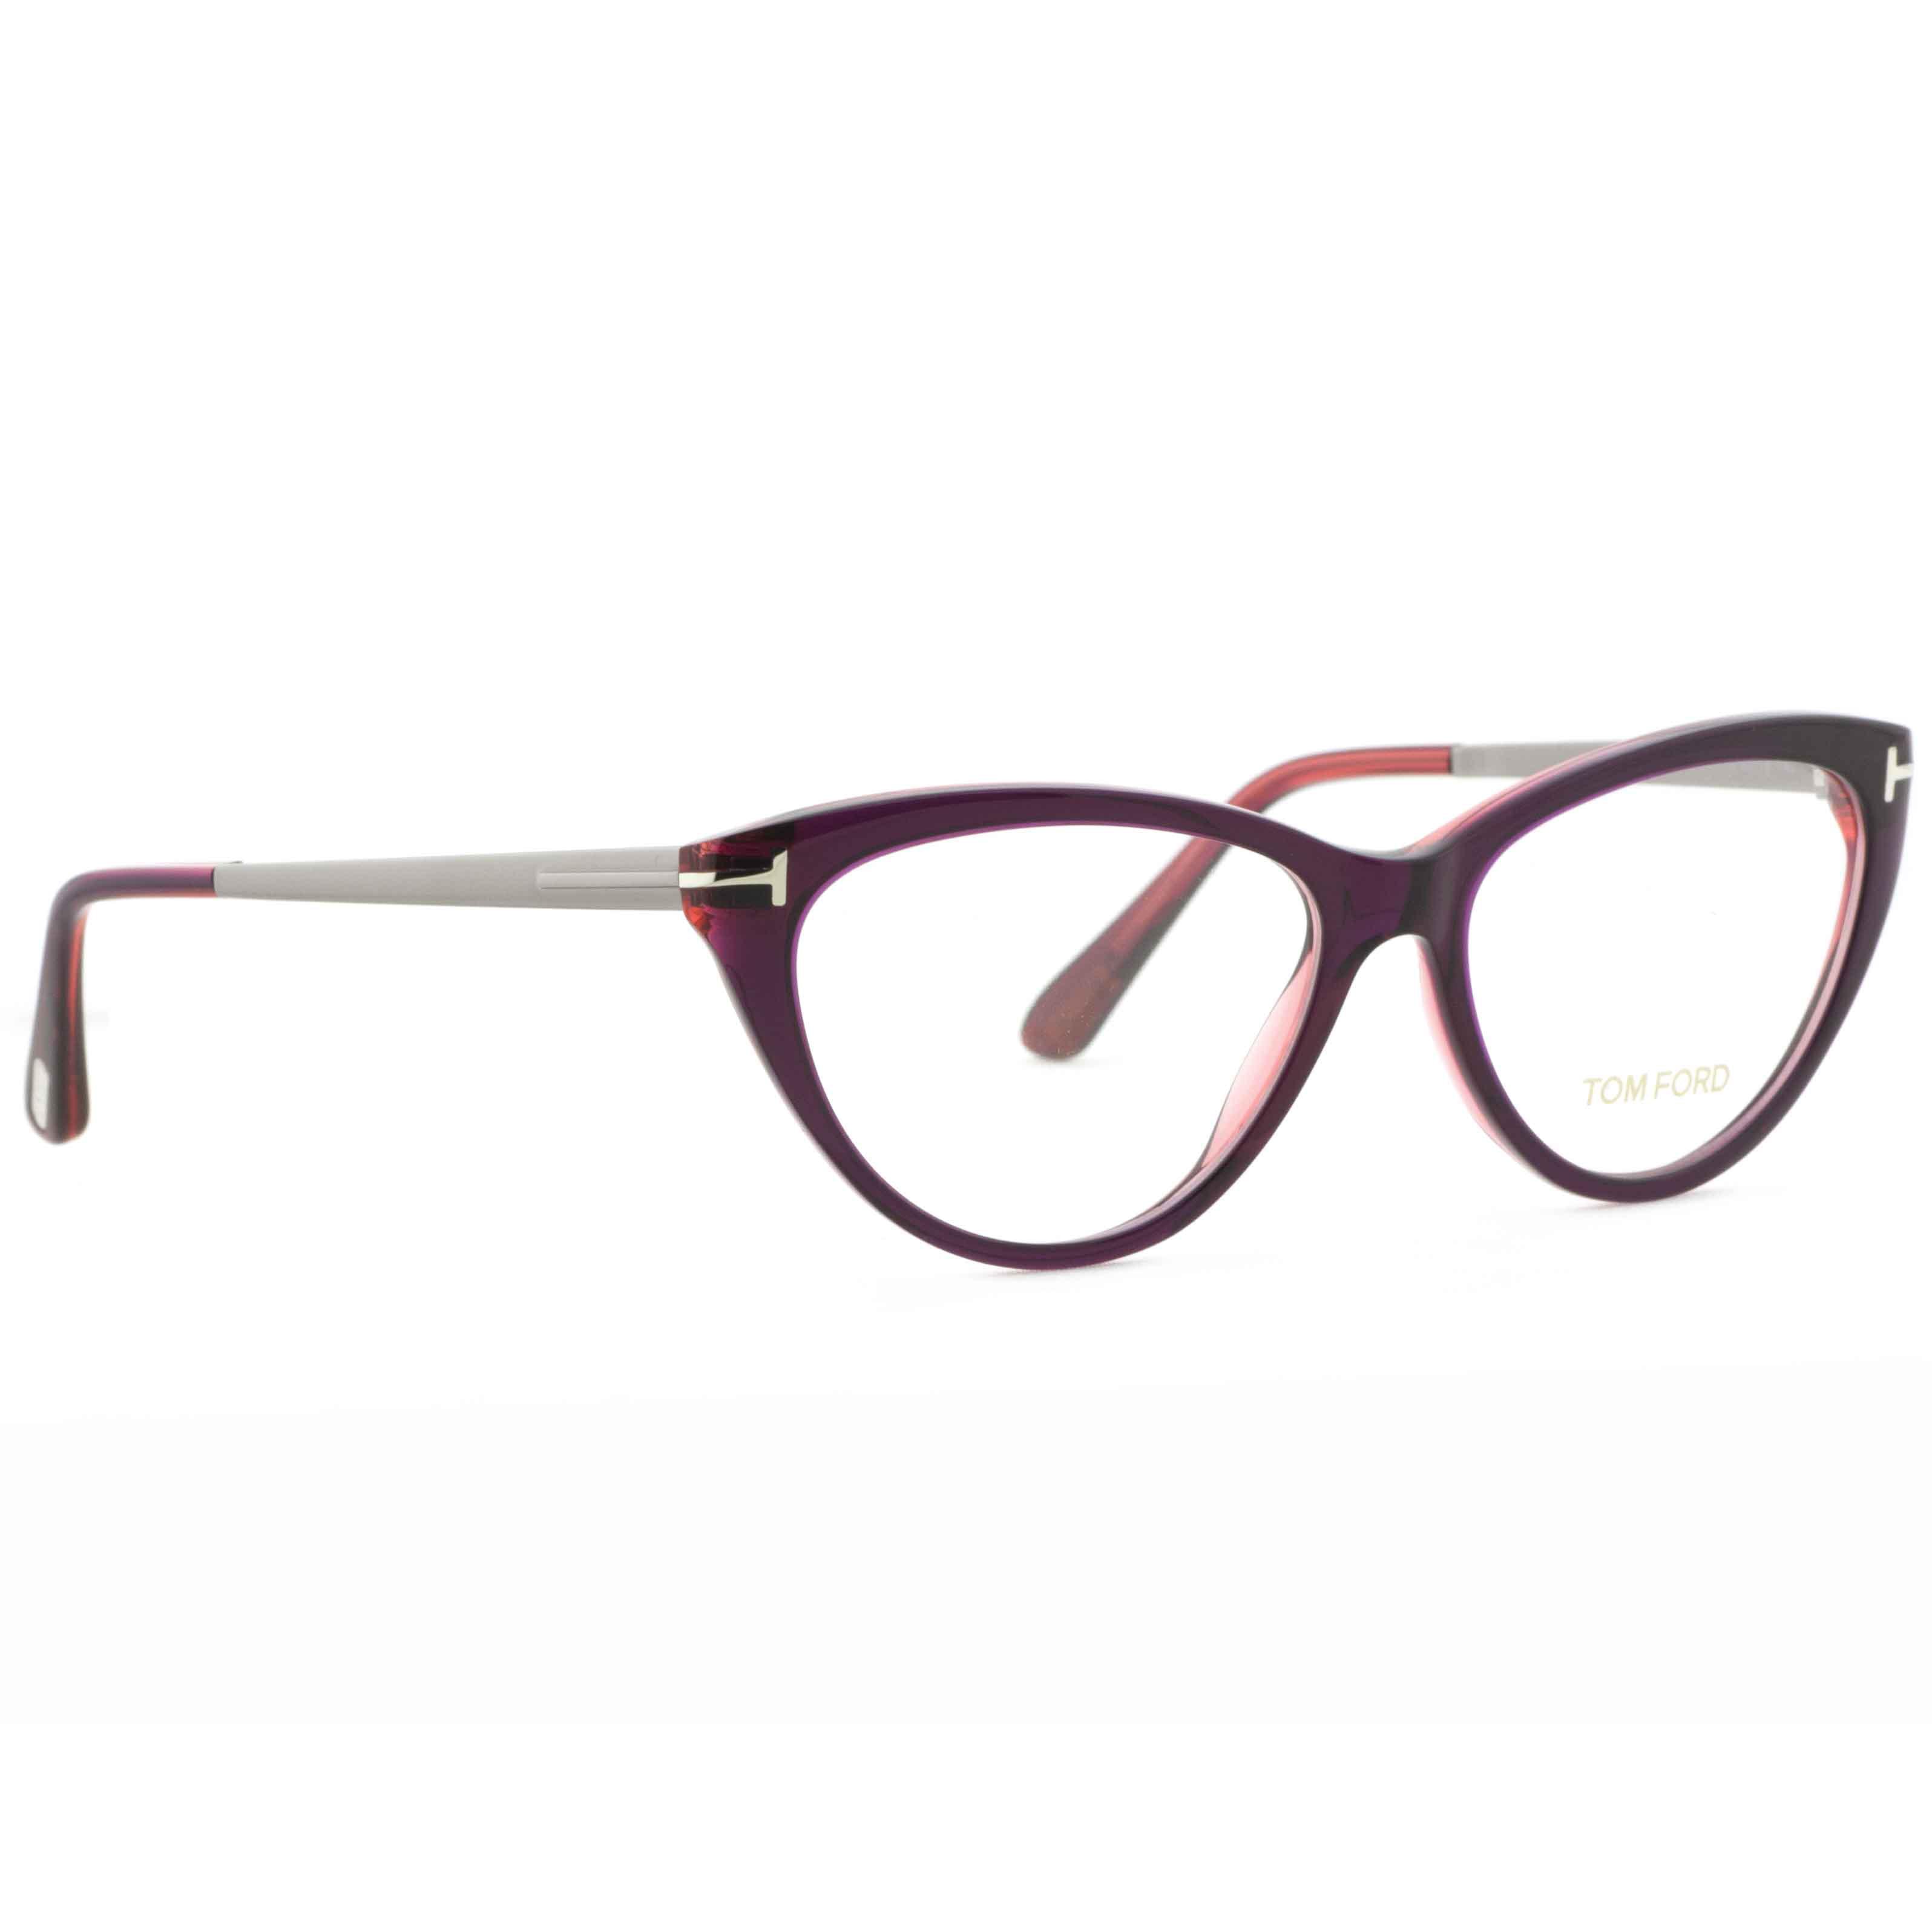 black tom titanium eyeglasses japan ford gold frame in made sam products